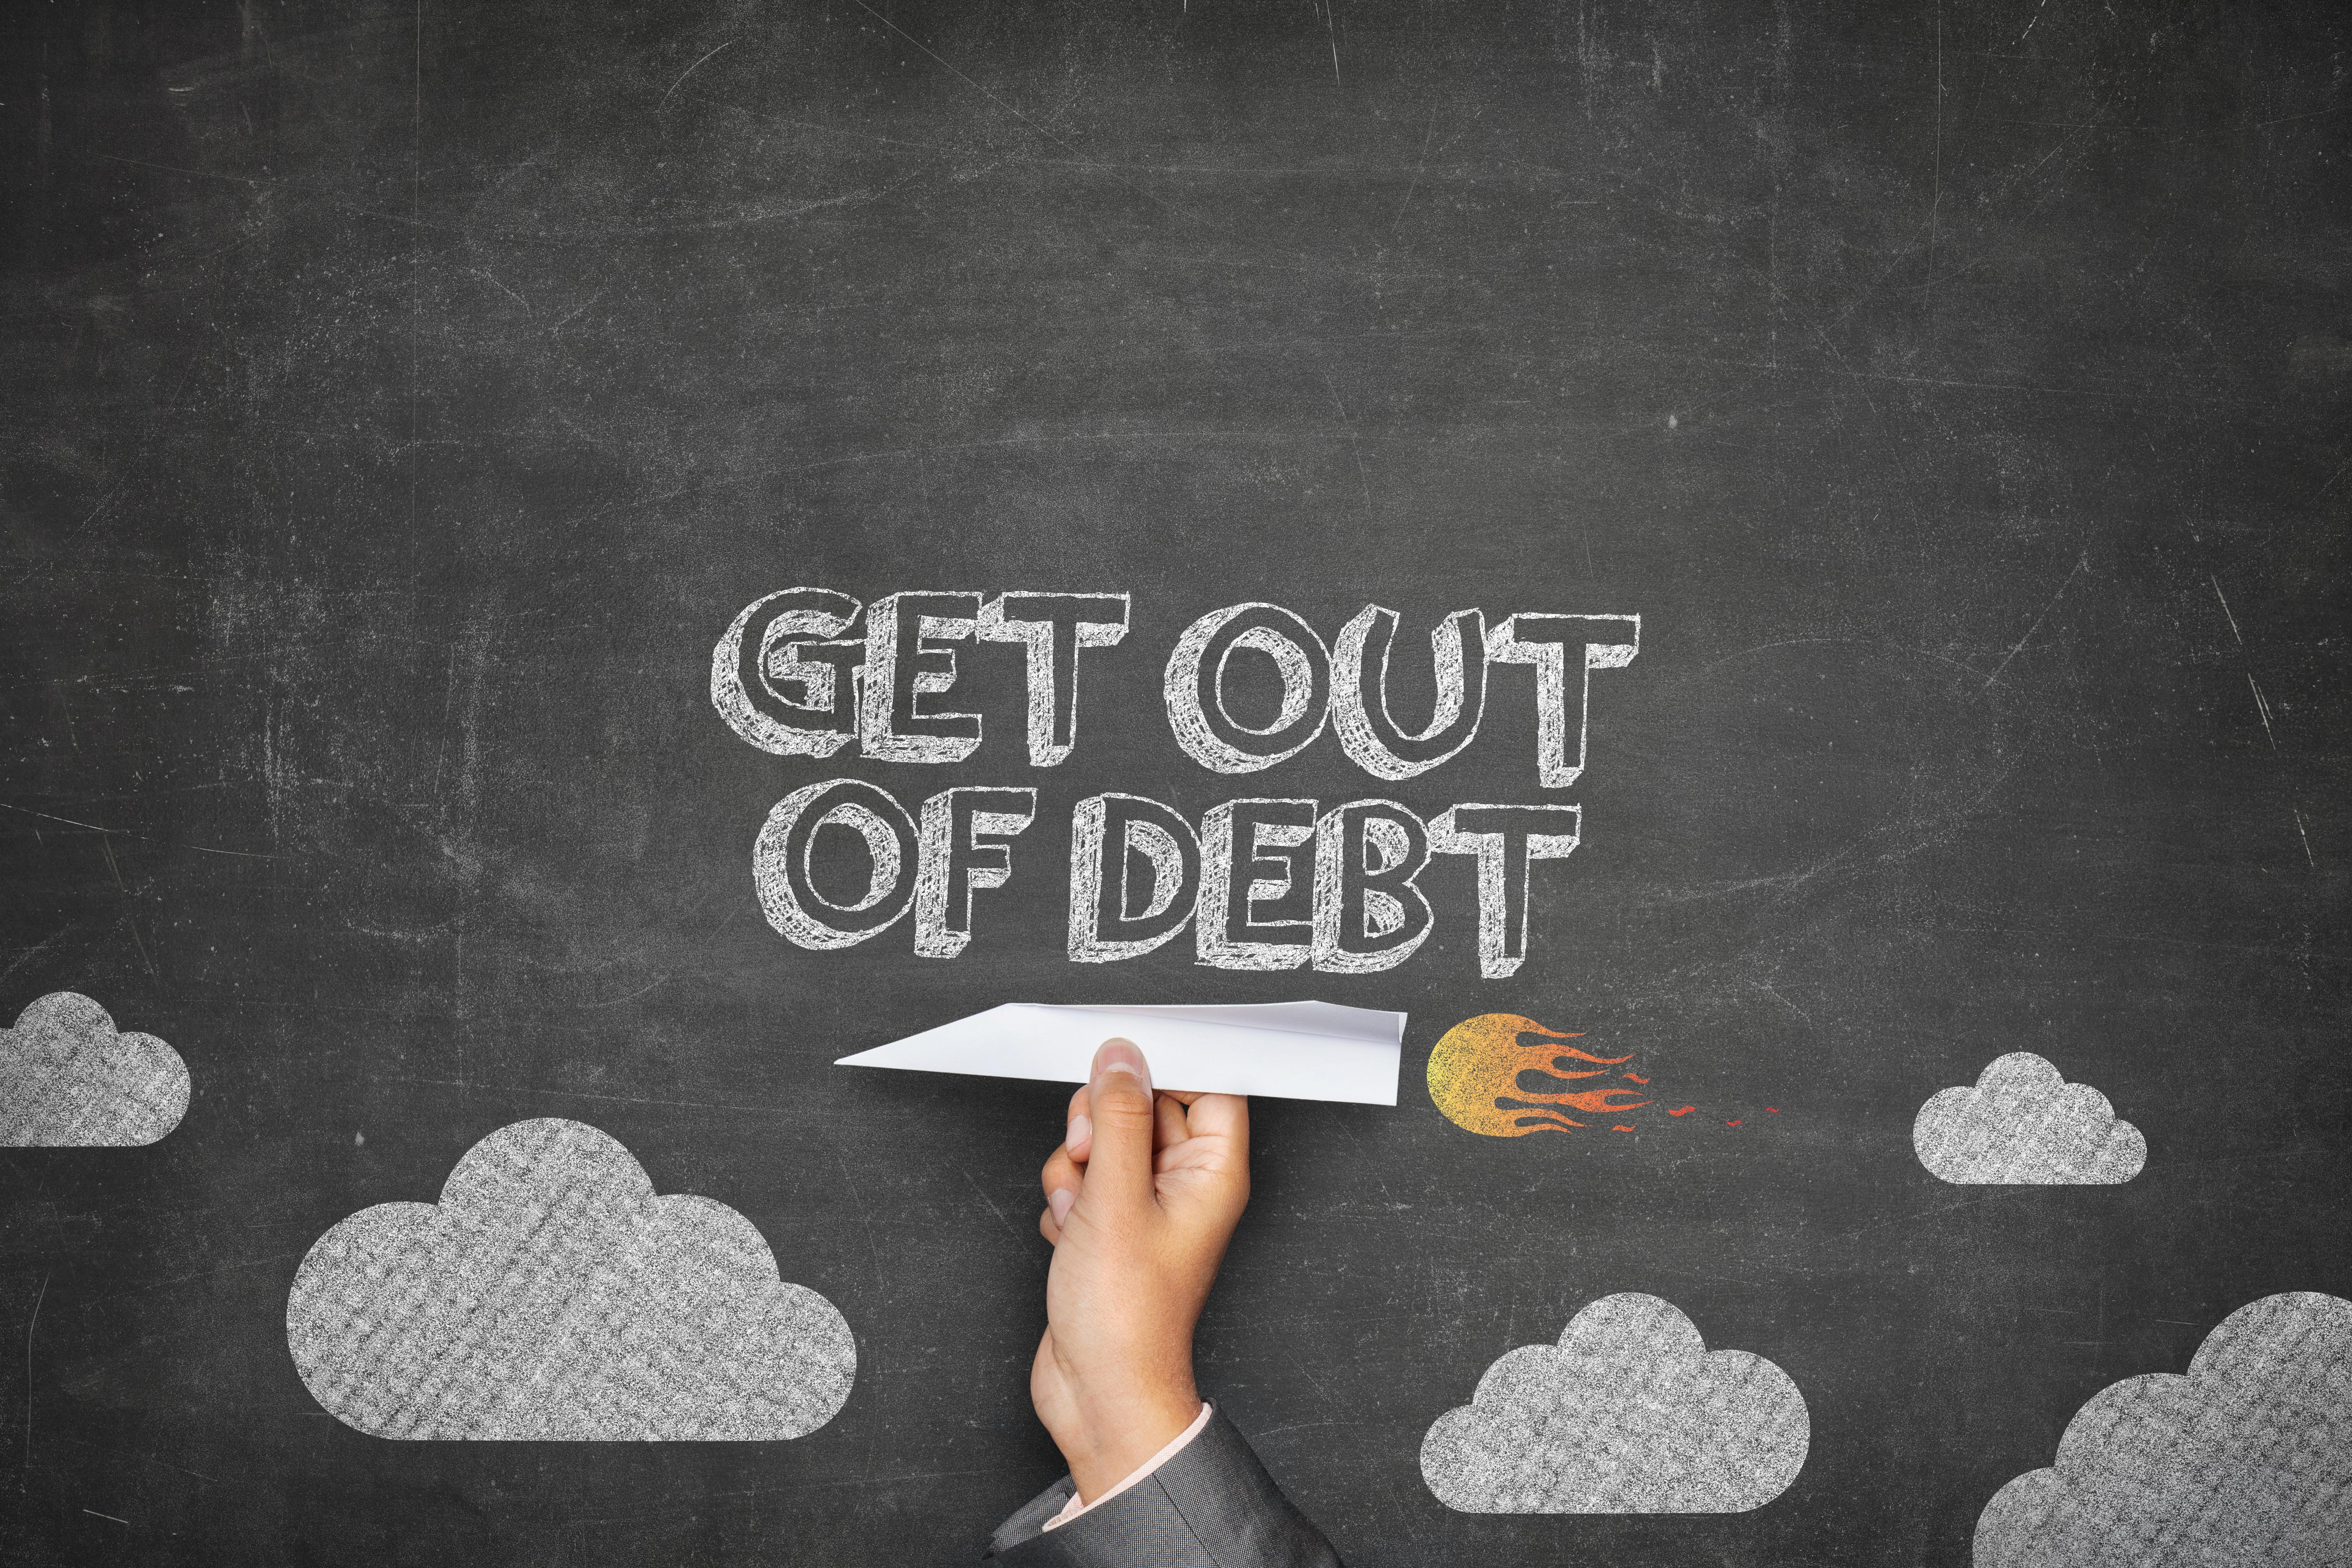 """Get Out of Debt"" written on a chalkboard"